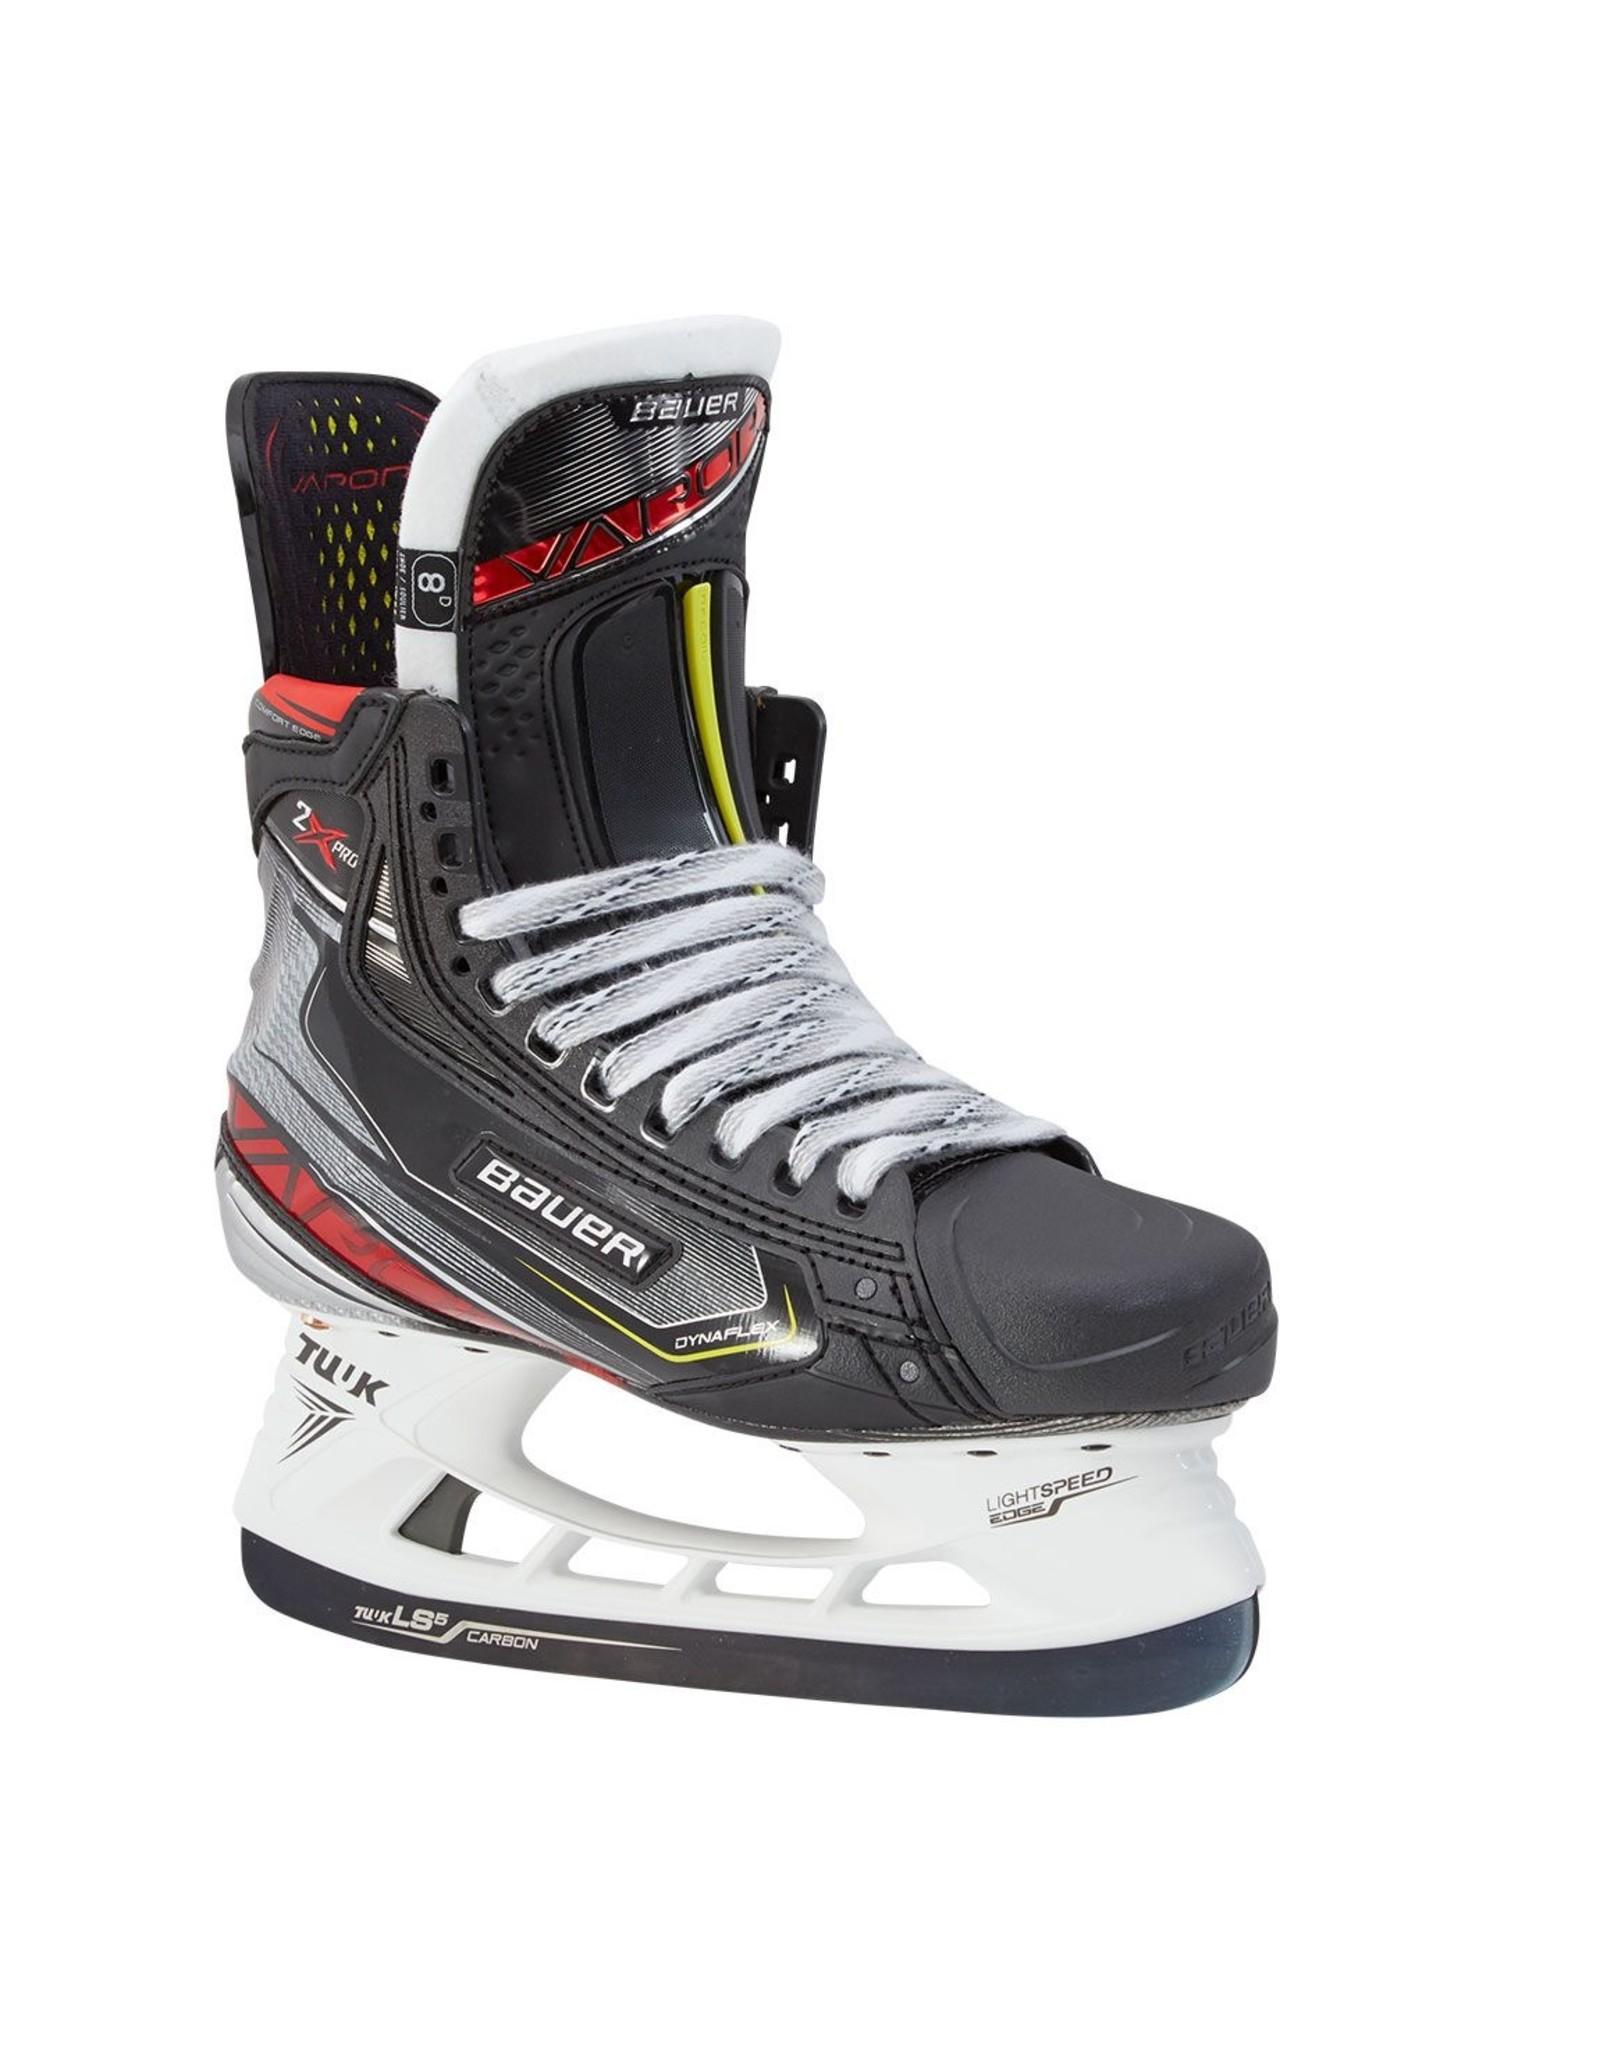 Bauer Hockey - Canada BAUER VAPOR 2X PRO SKATE '19 - JR